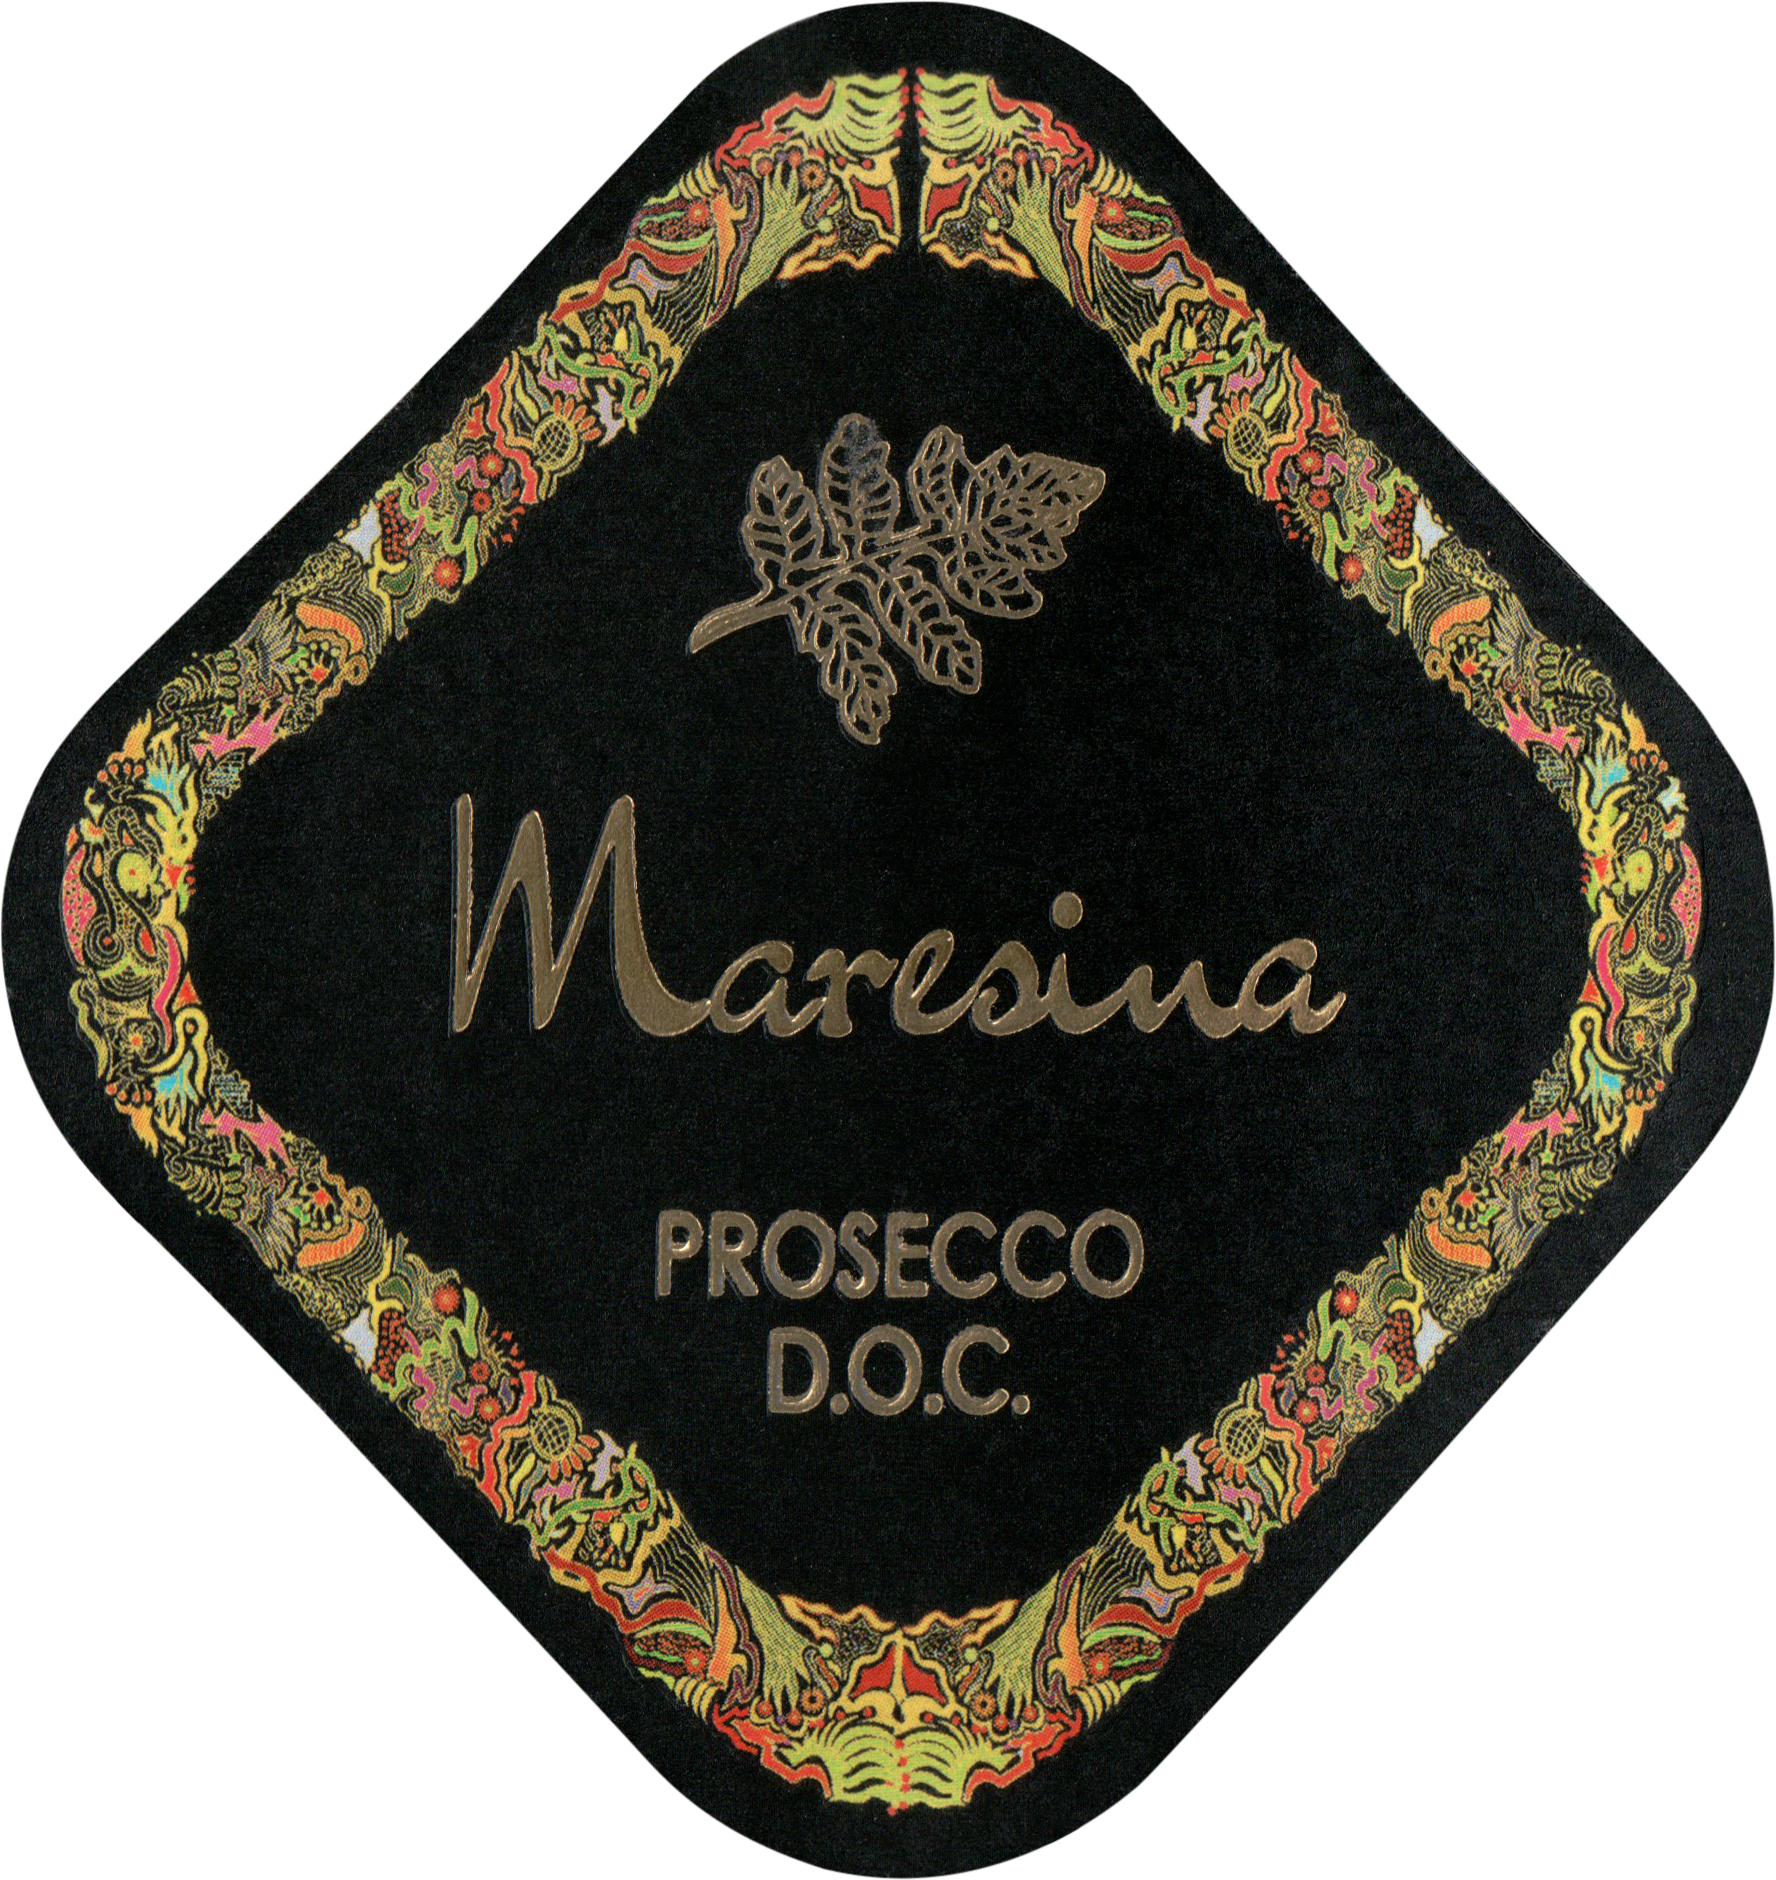 Maresina Prosecco